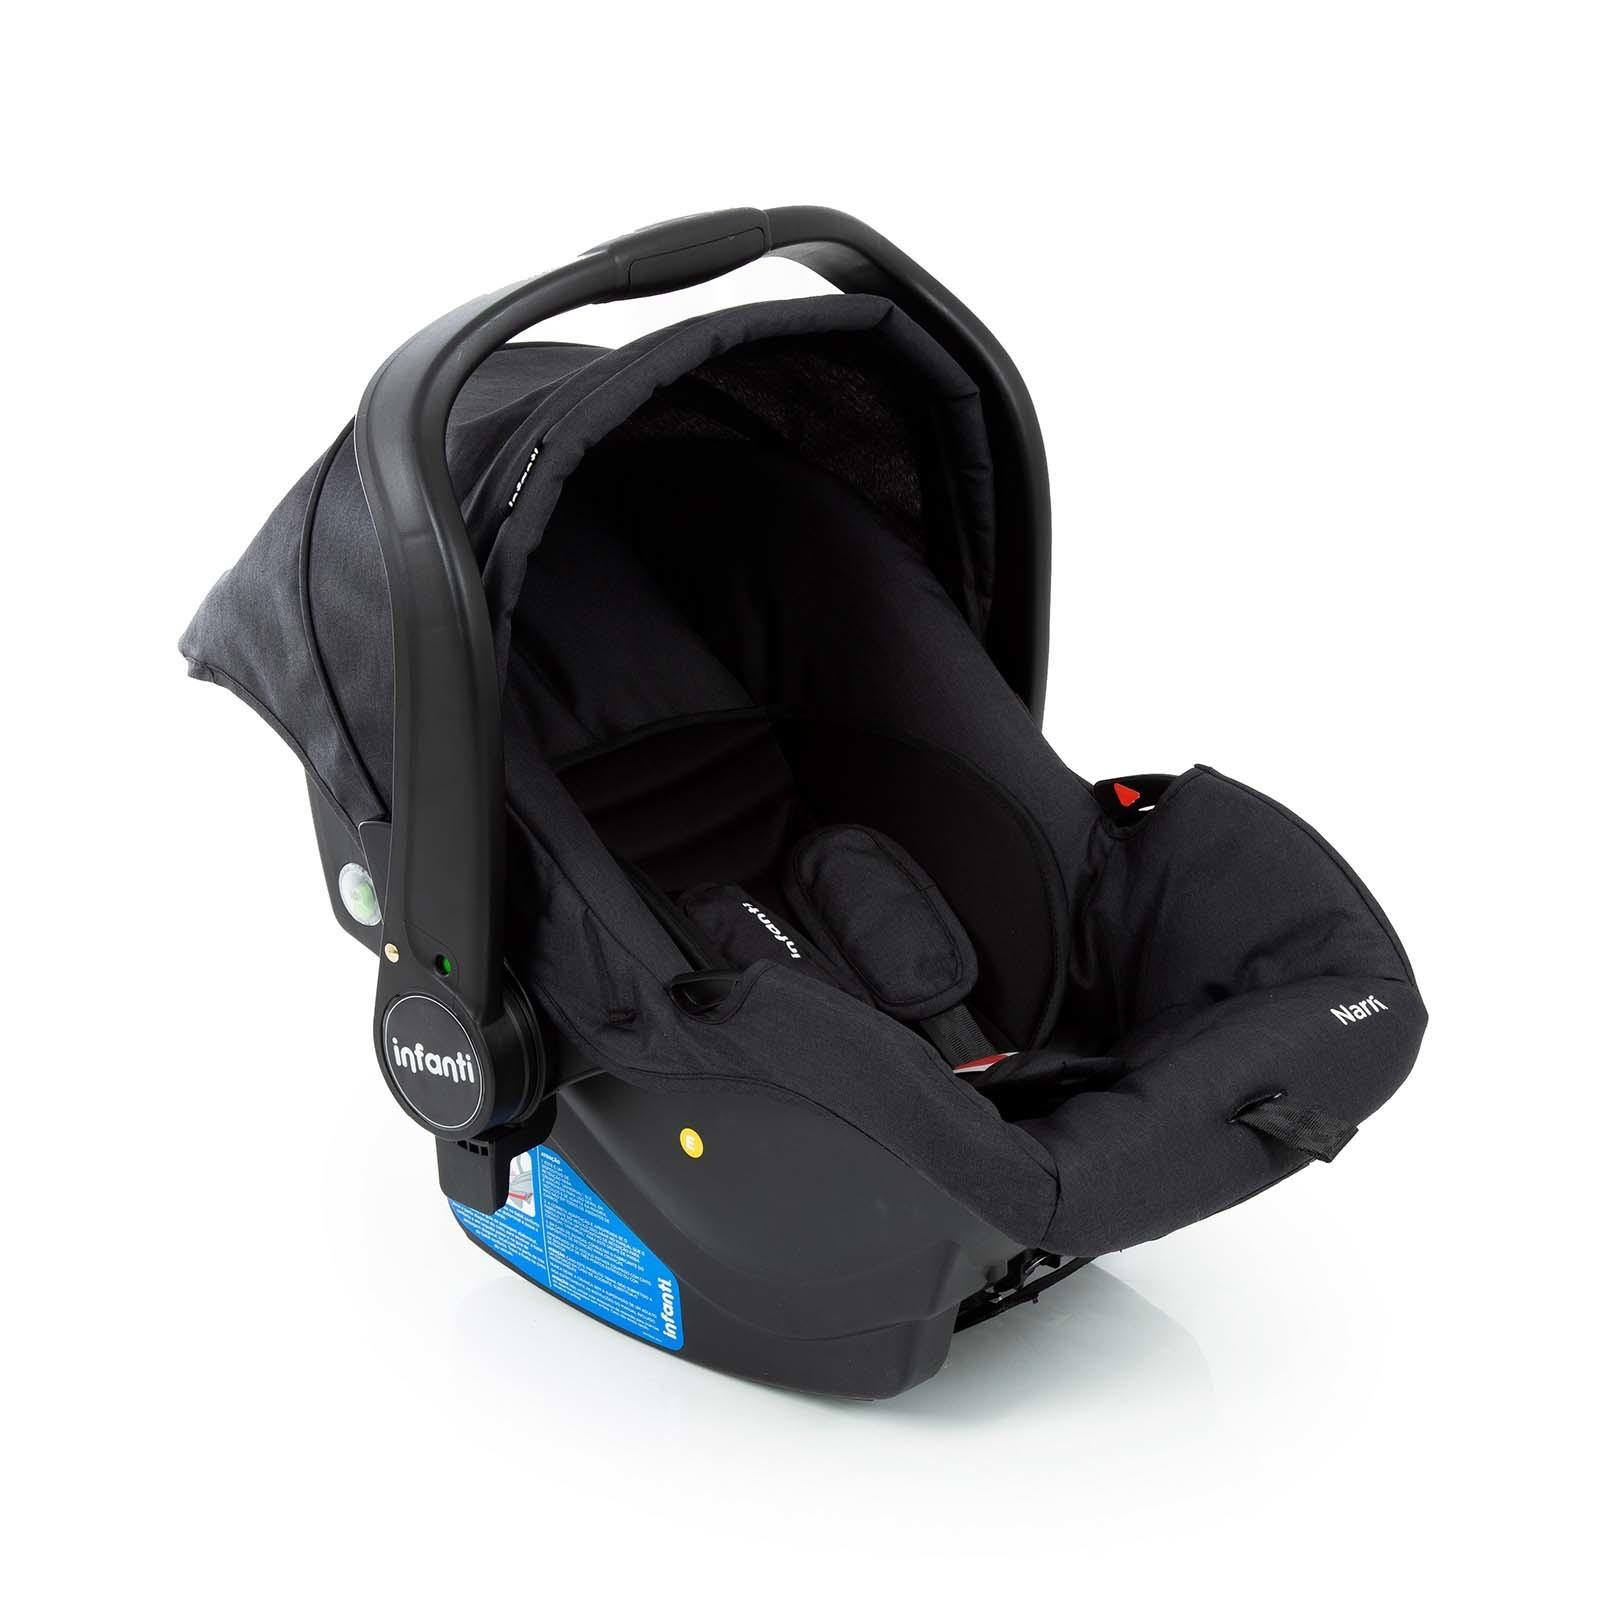 Carrinho com Bebê Conforto Collina Travel System - Black Style- Infanti